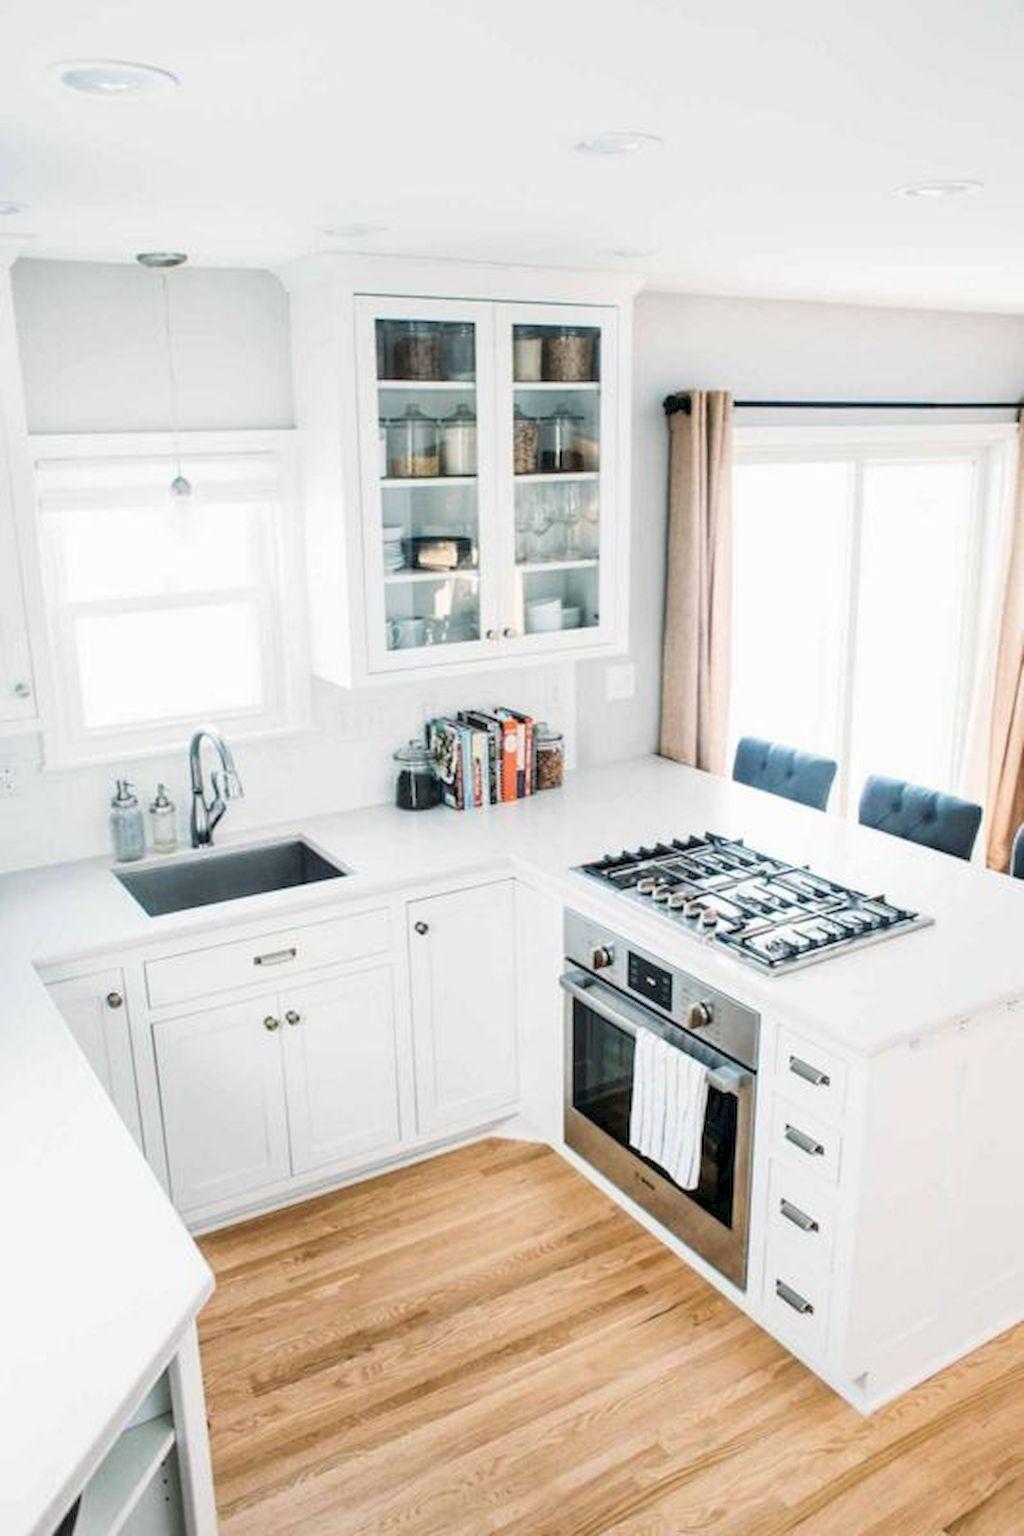 Ideas for kitchen decor  Cool  Incredible Tiny House Kitchen Decor Ideas